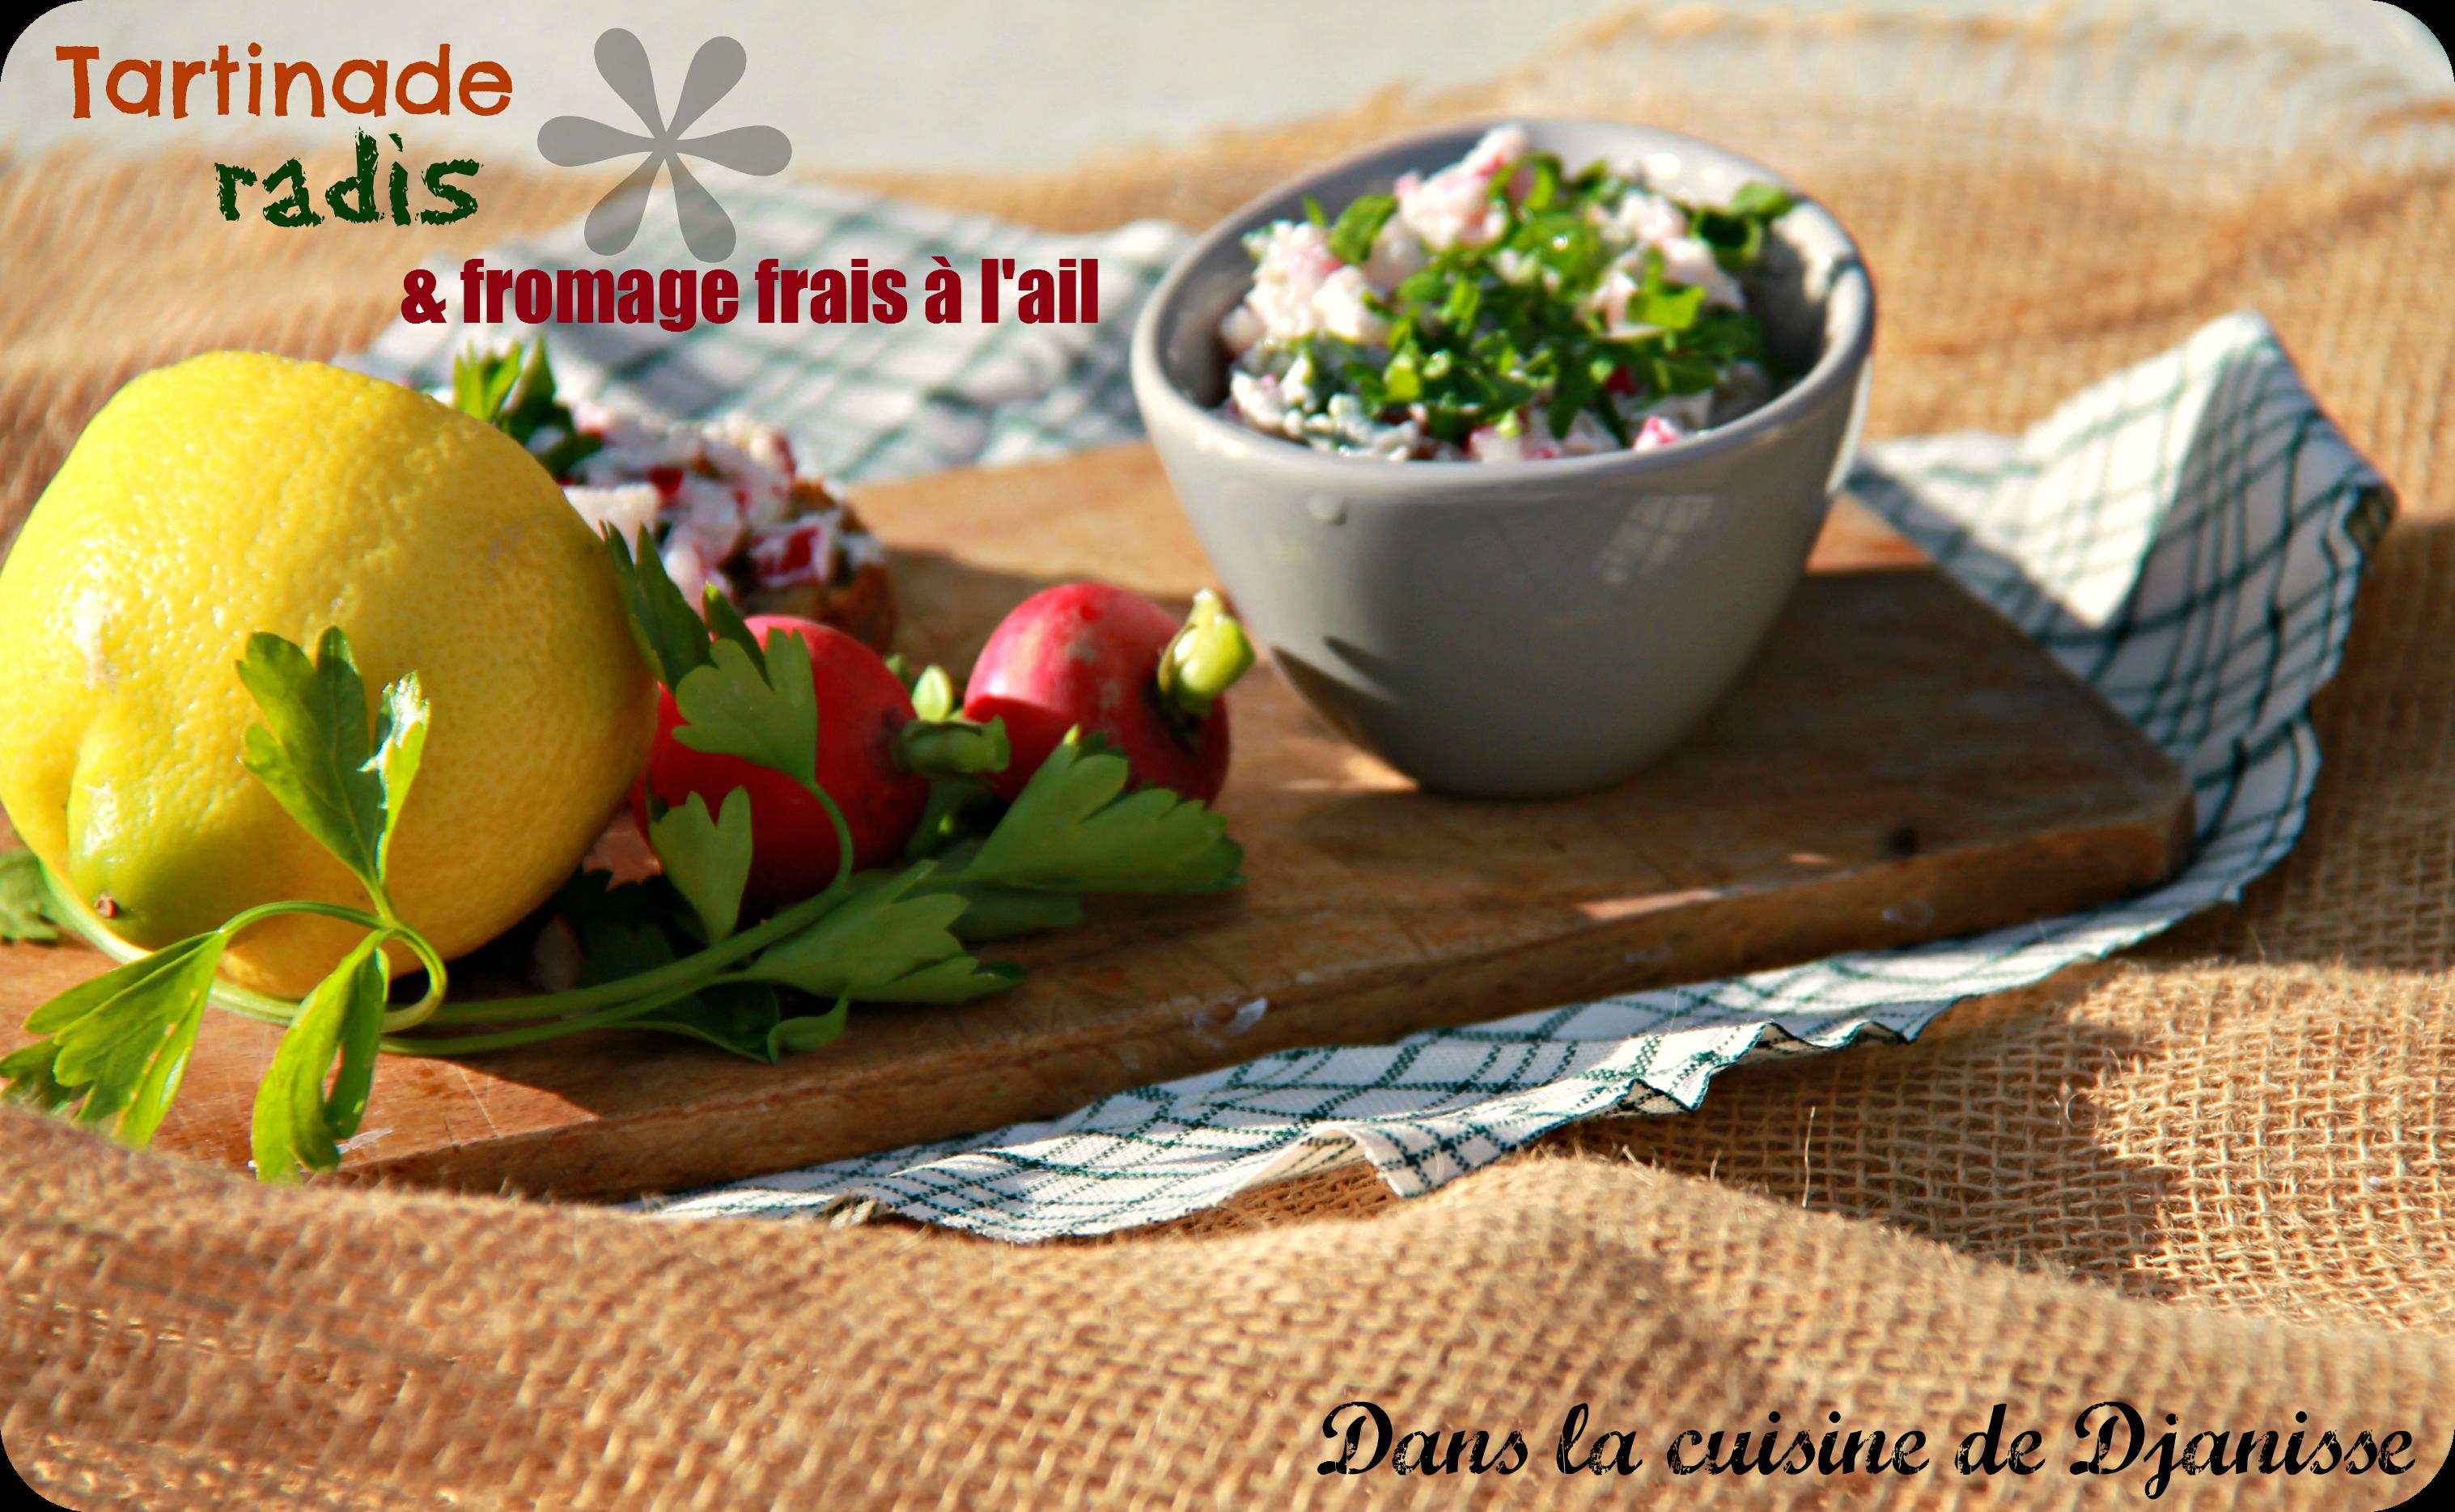 Tartinade radis et fromage frais